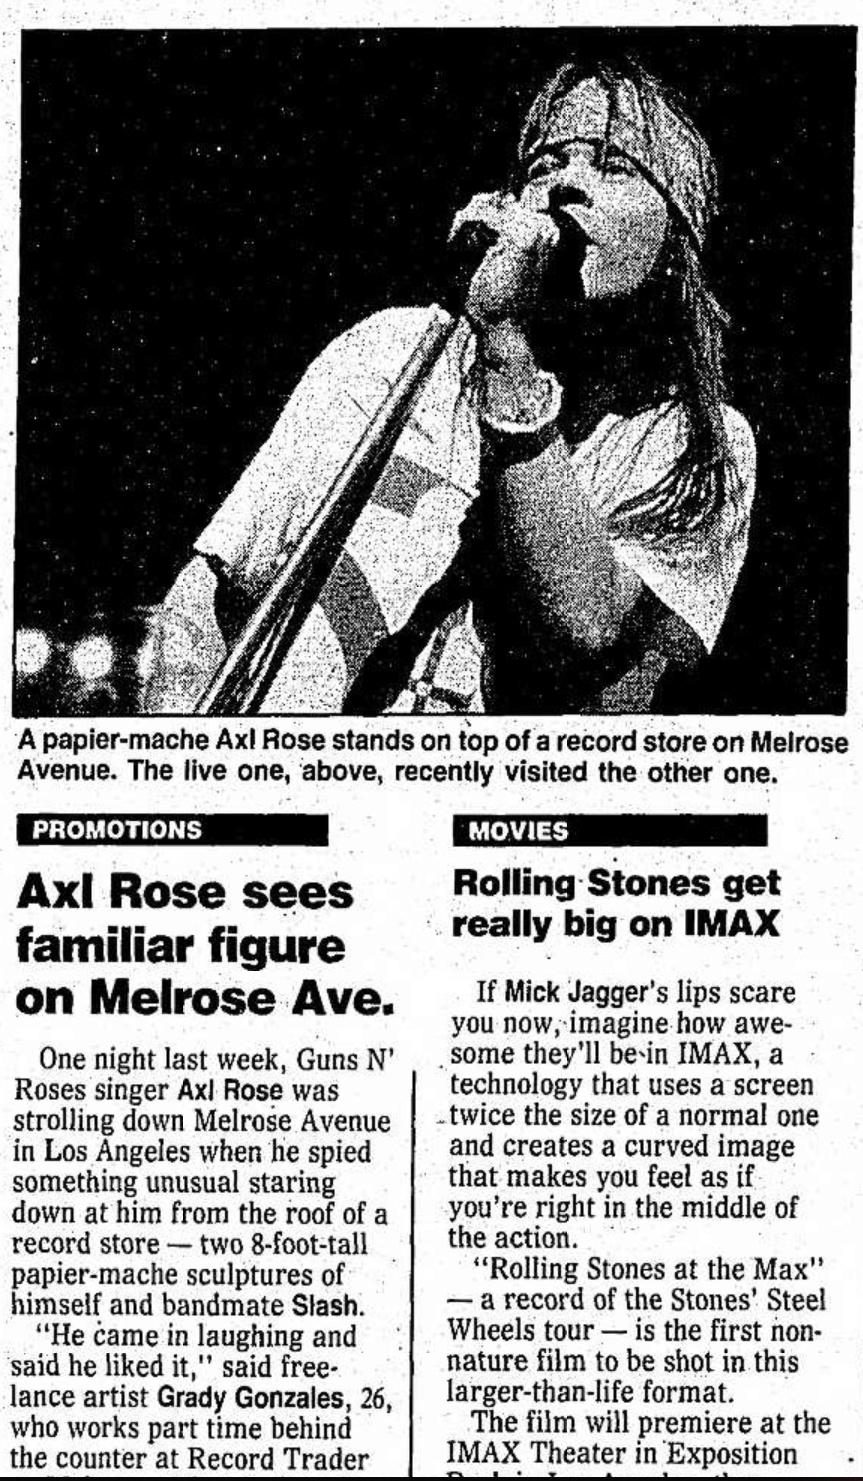 1991.10.14 - Santa Ana County Register - Axl Roses Sees Familiar Figure on Melrose Ave. Santa_10